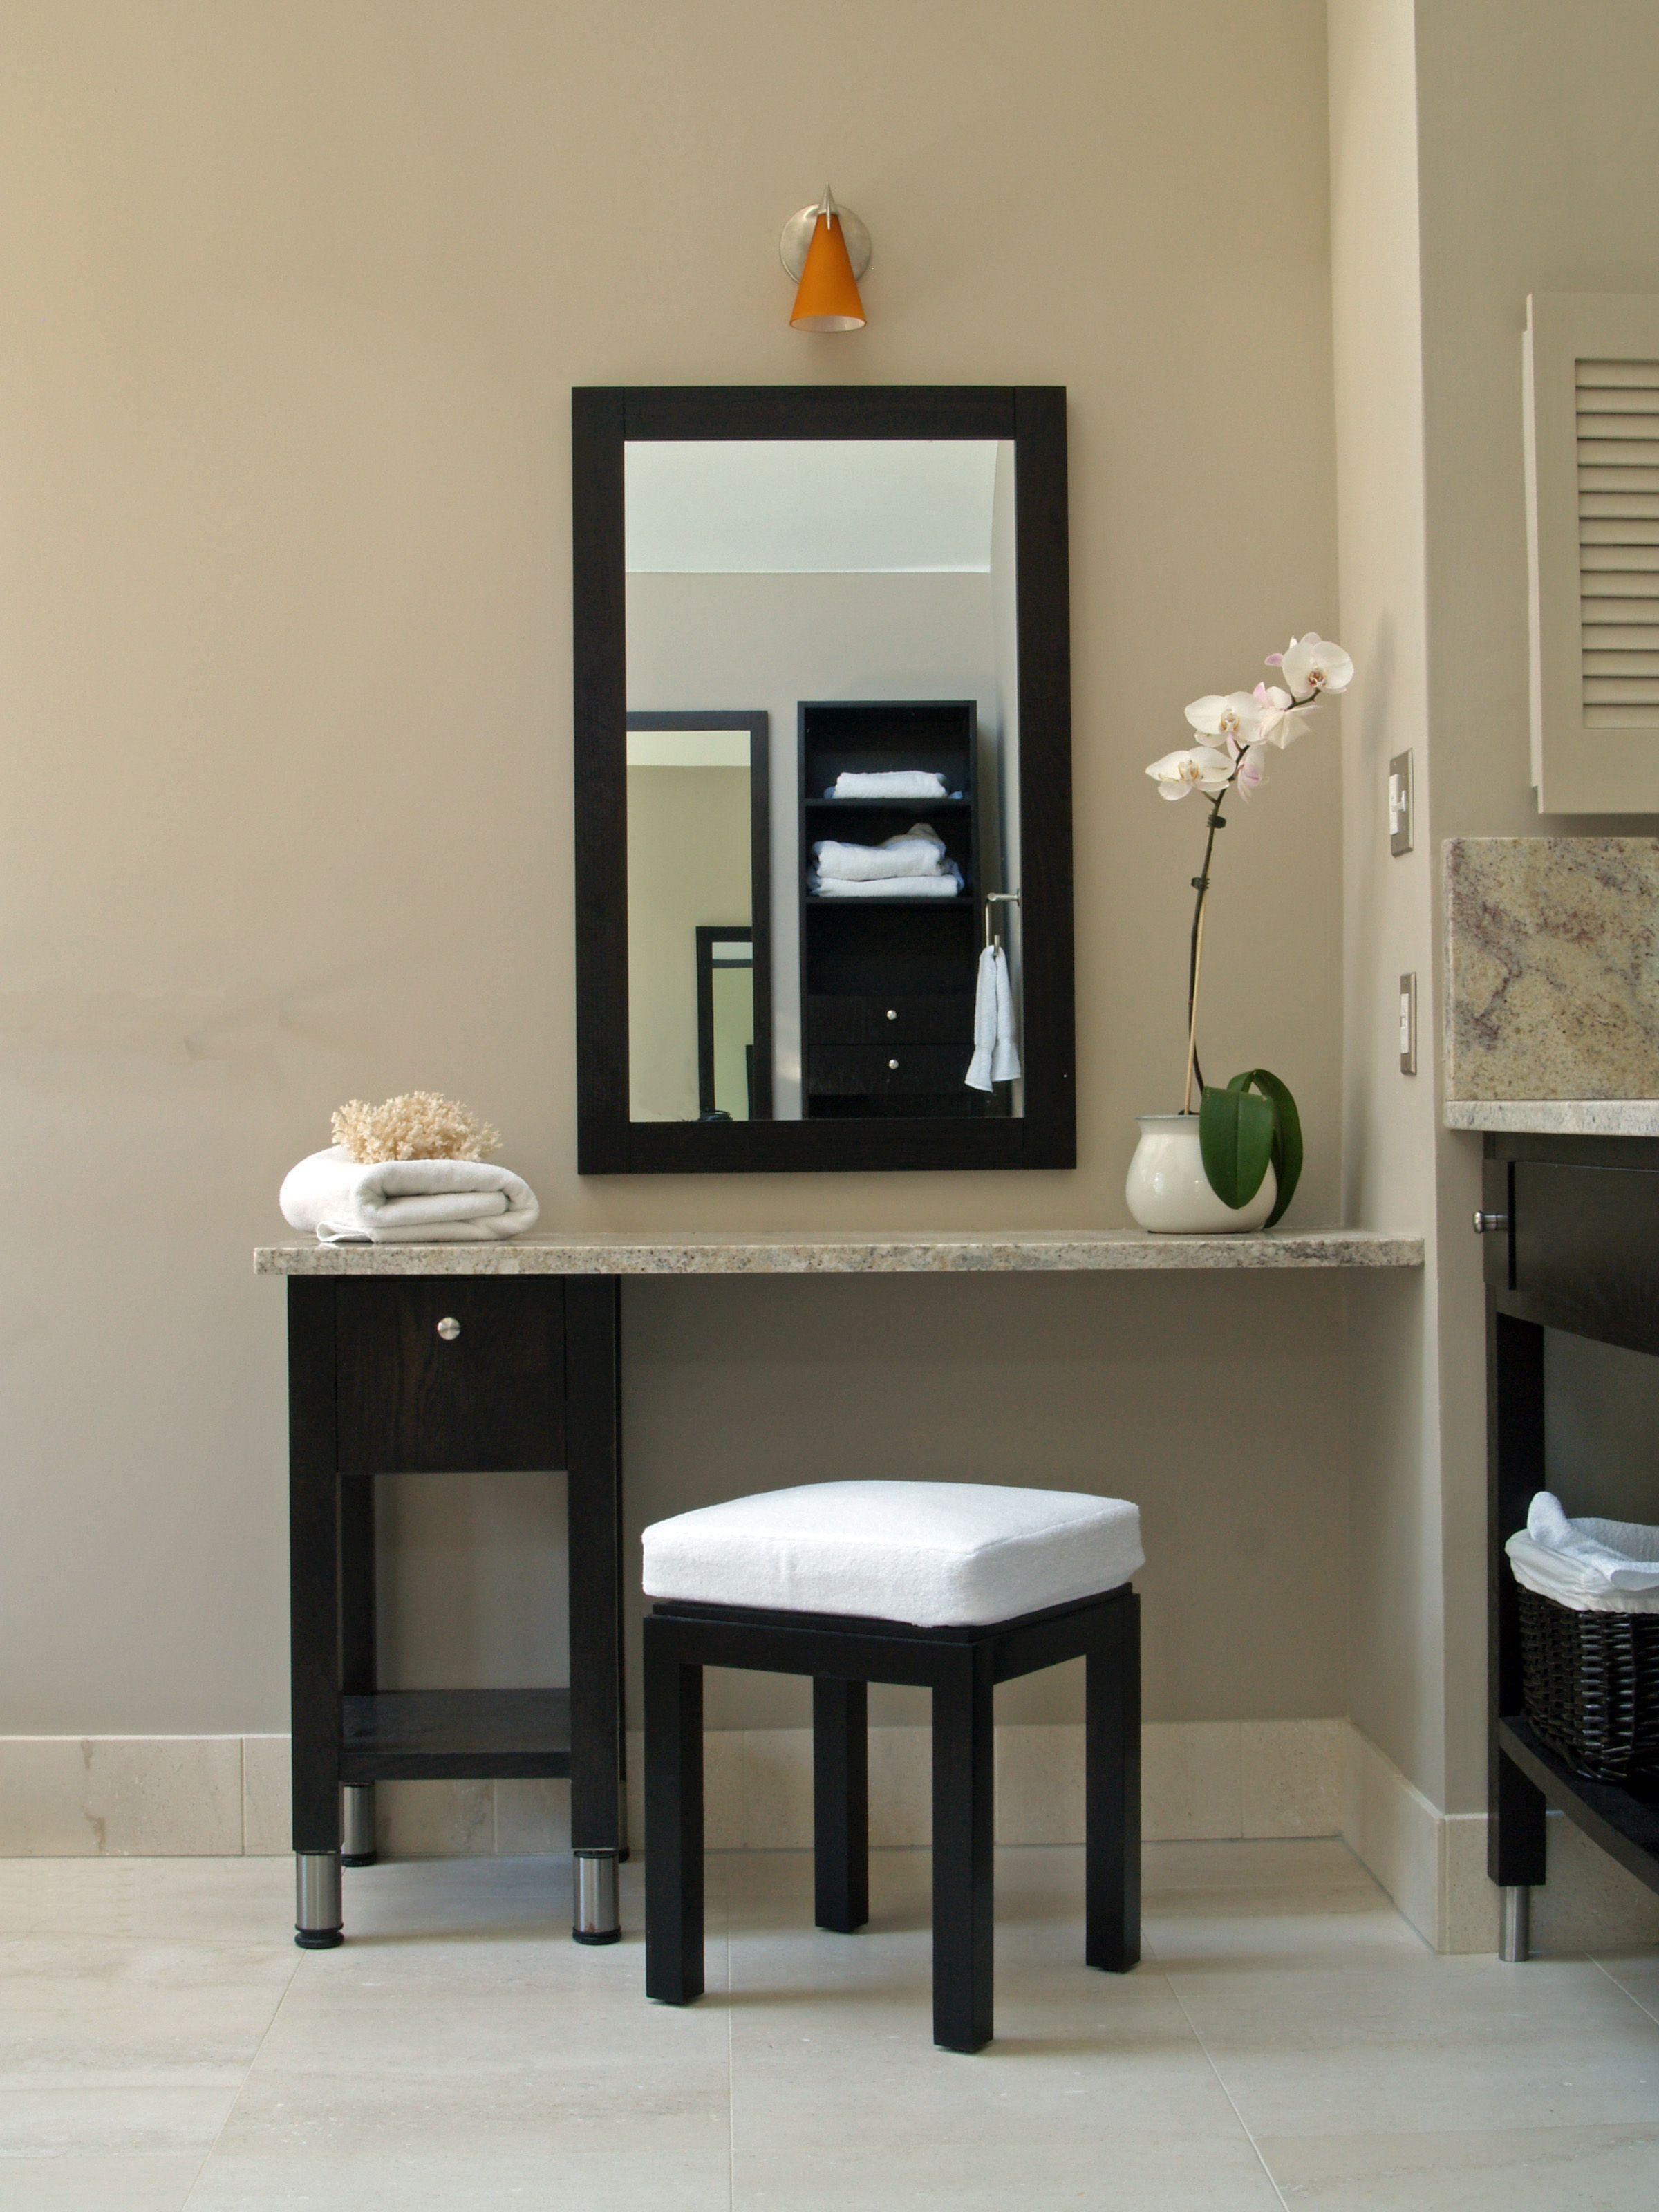 Hotel Style Bathroom Vanity Open Shelving Main Line